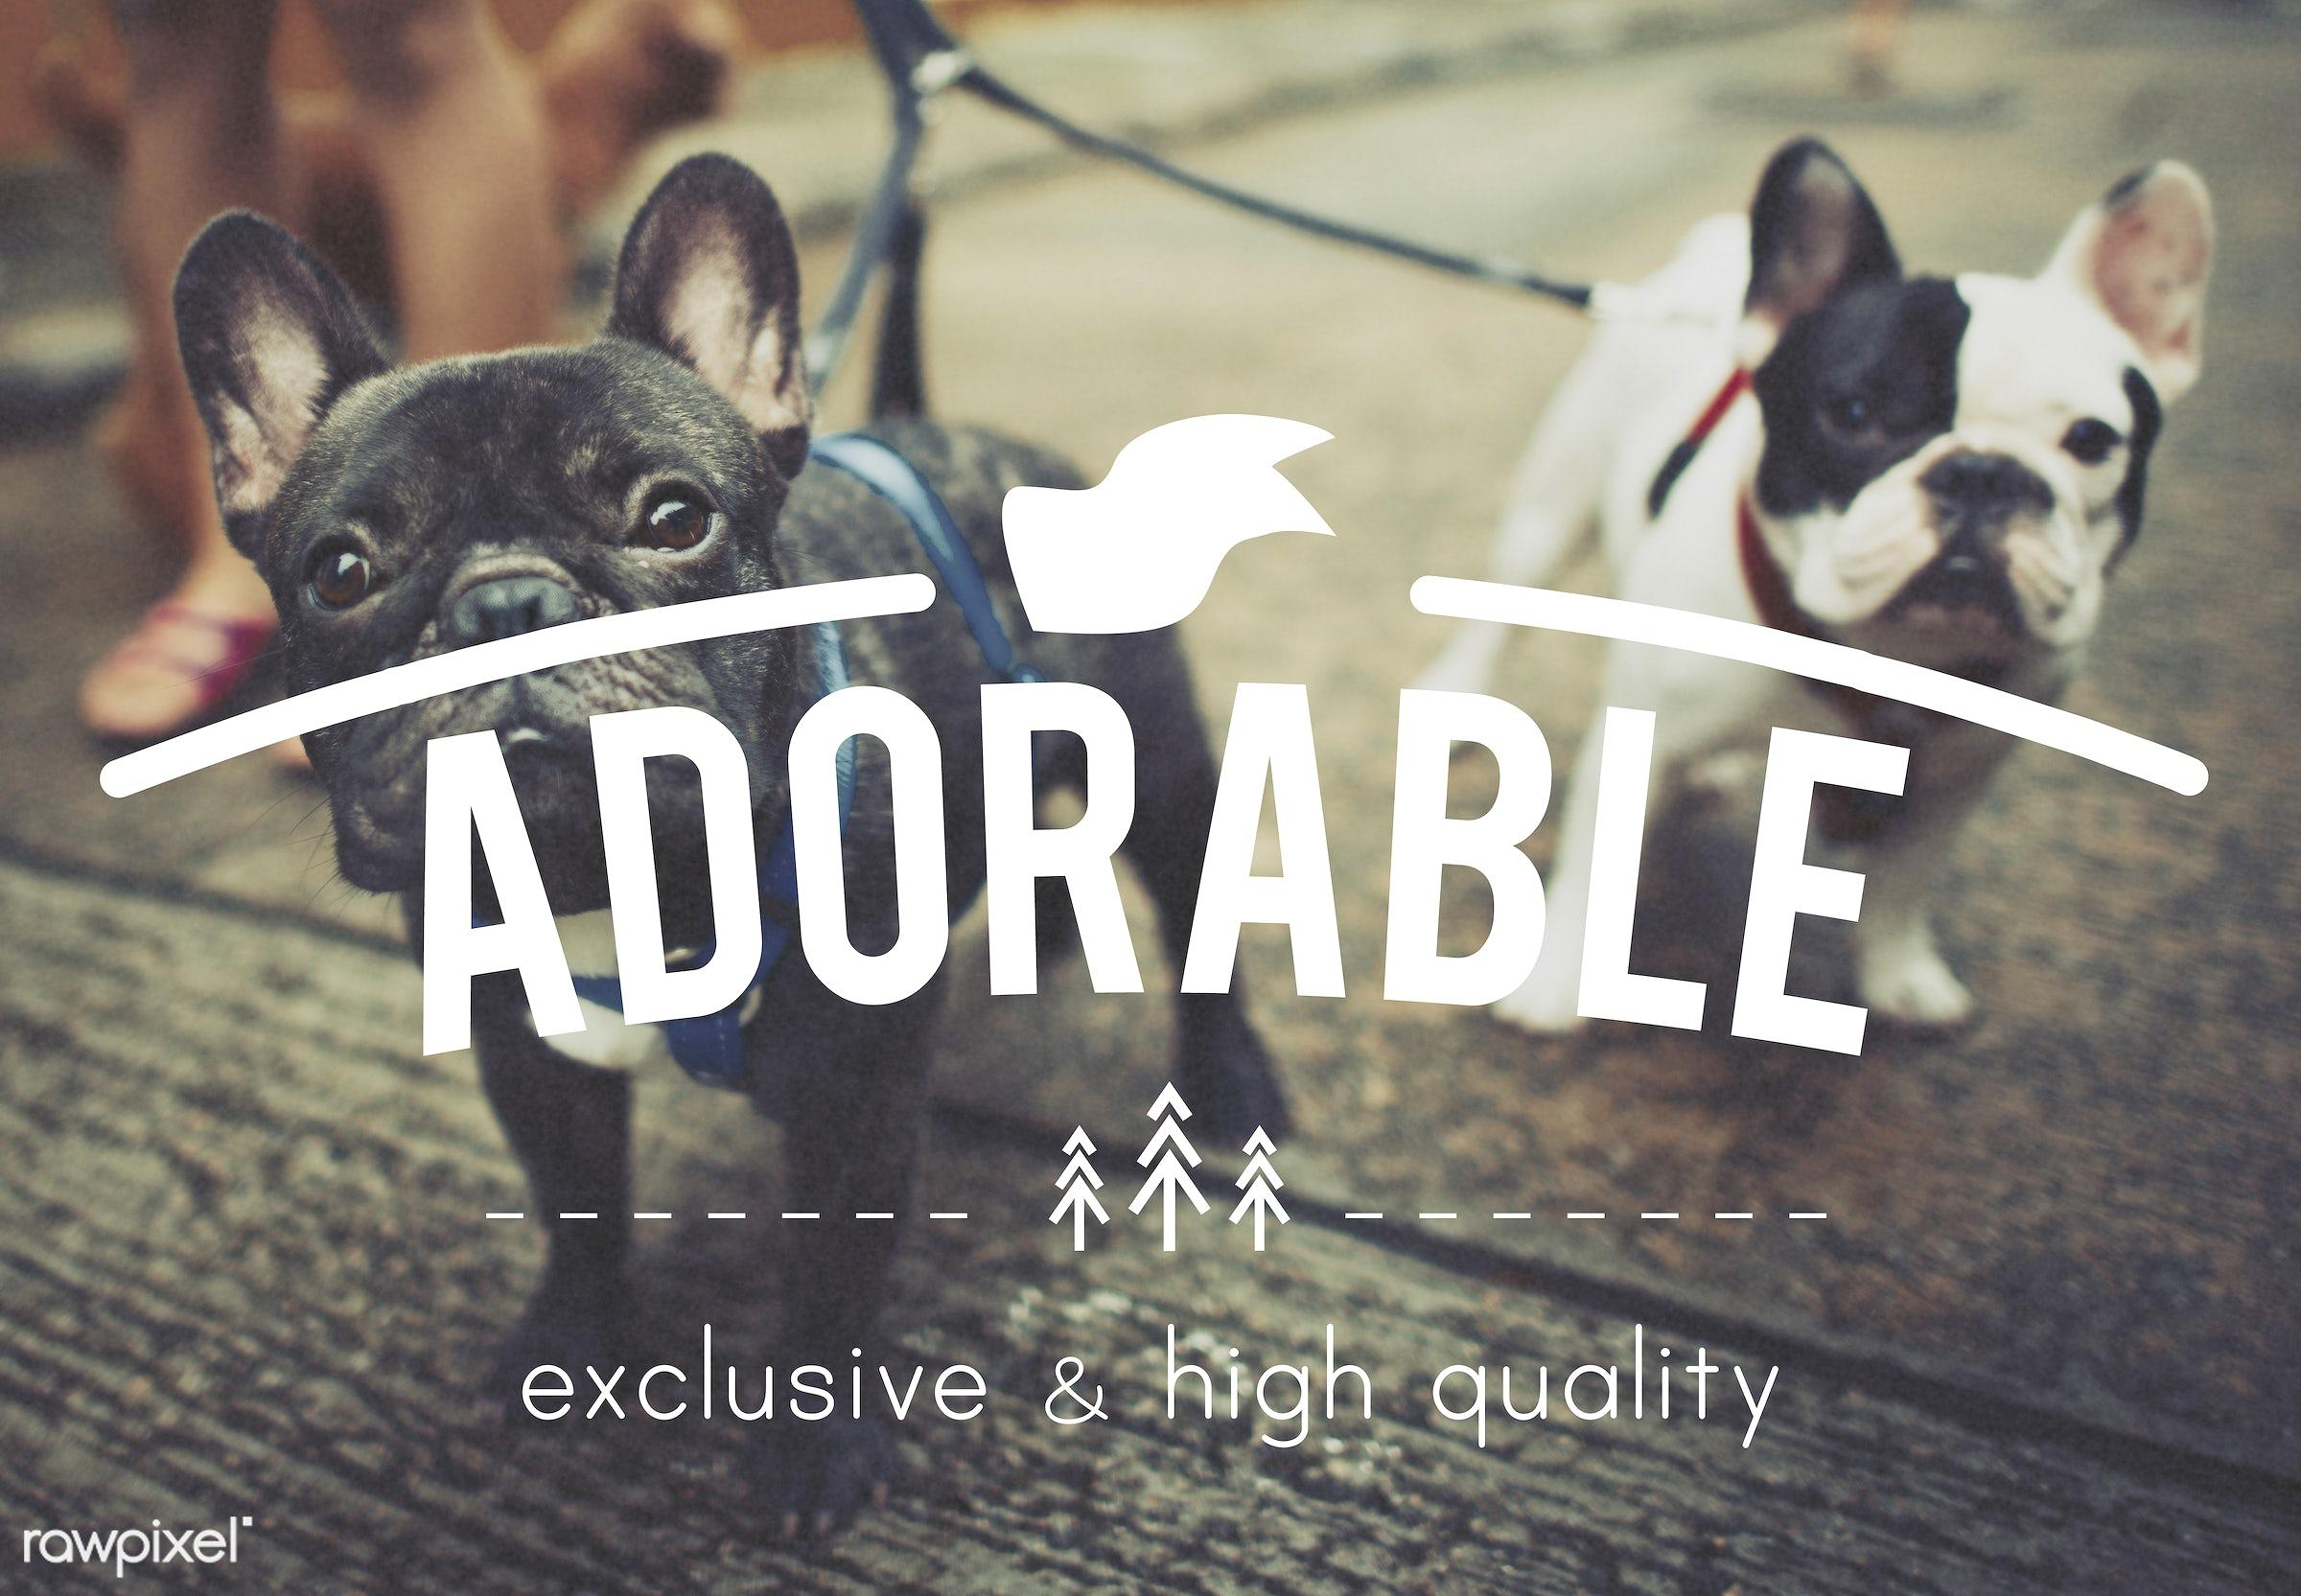 adopt, adopt me, adorable, animal, animals, babies, breed, bulldog, care, cute, dog, exclusive, french bulldog, friends, fun...